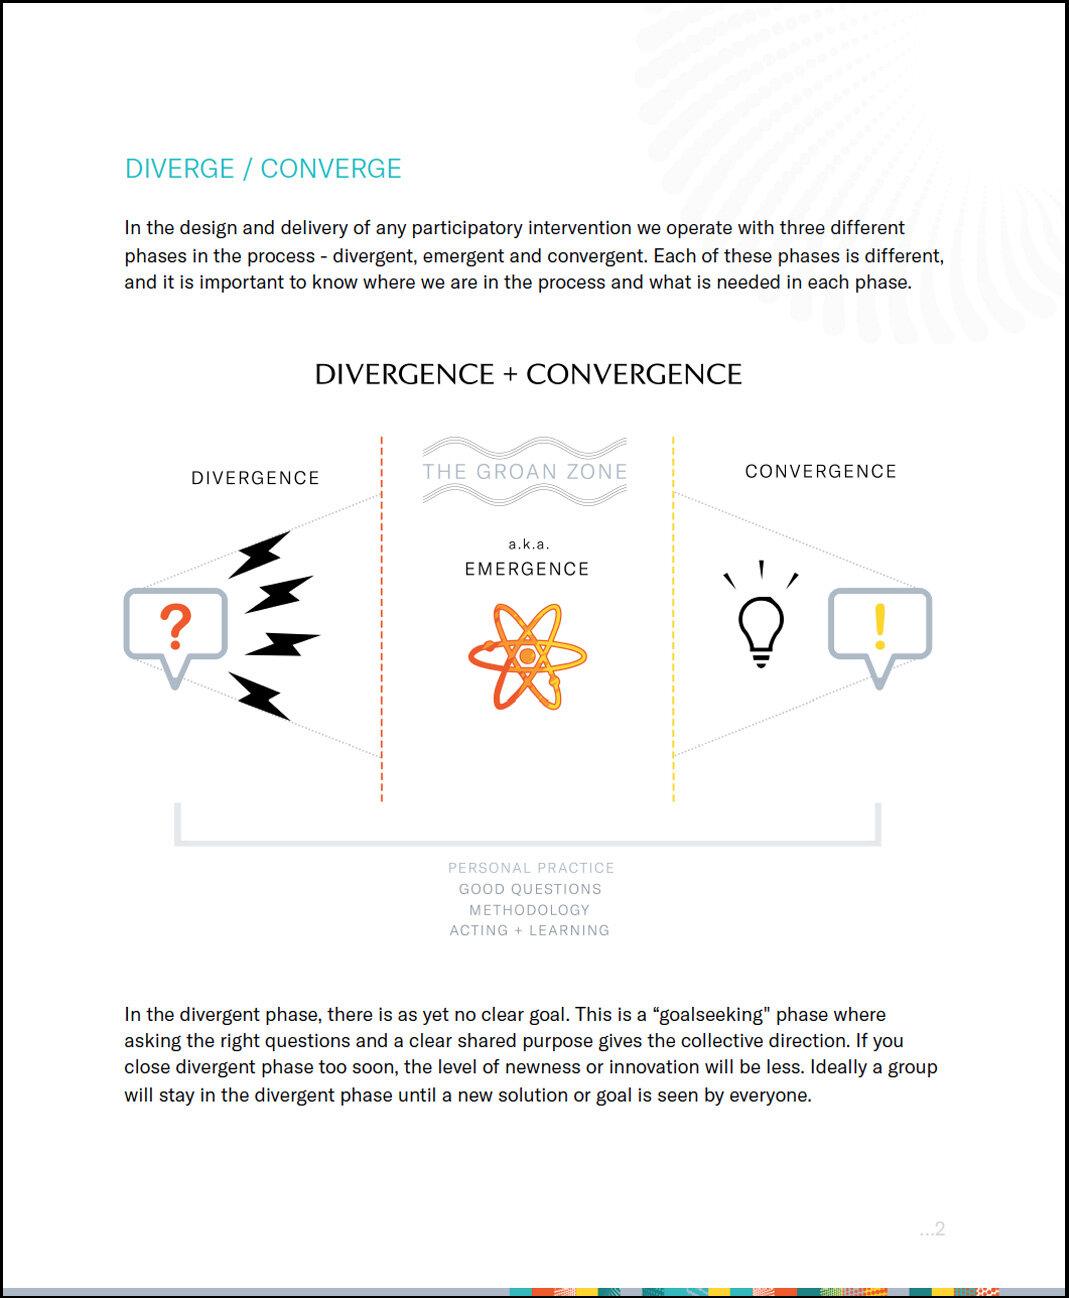 DOWNLOAD: DIVERGE/CONVERGE